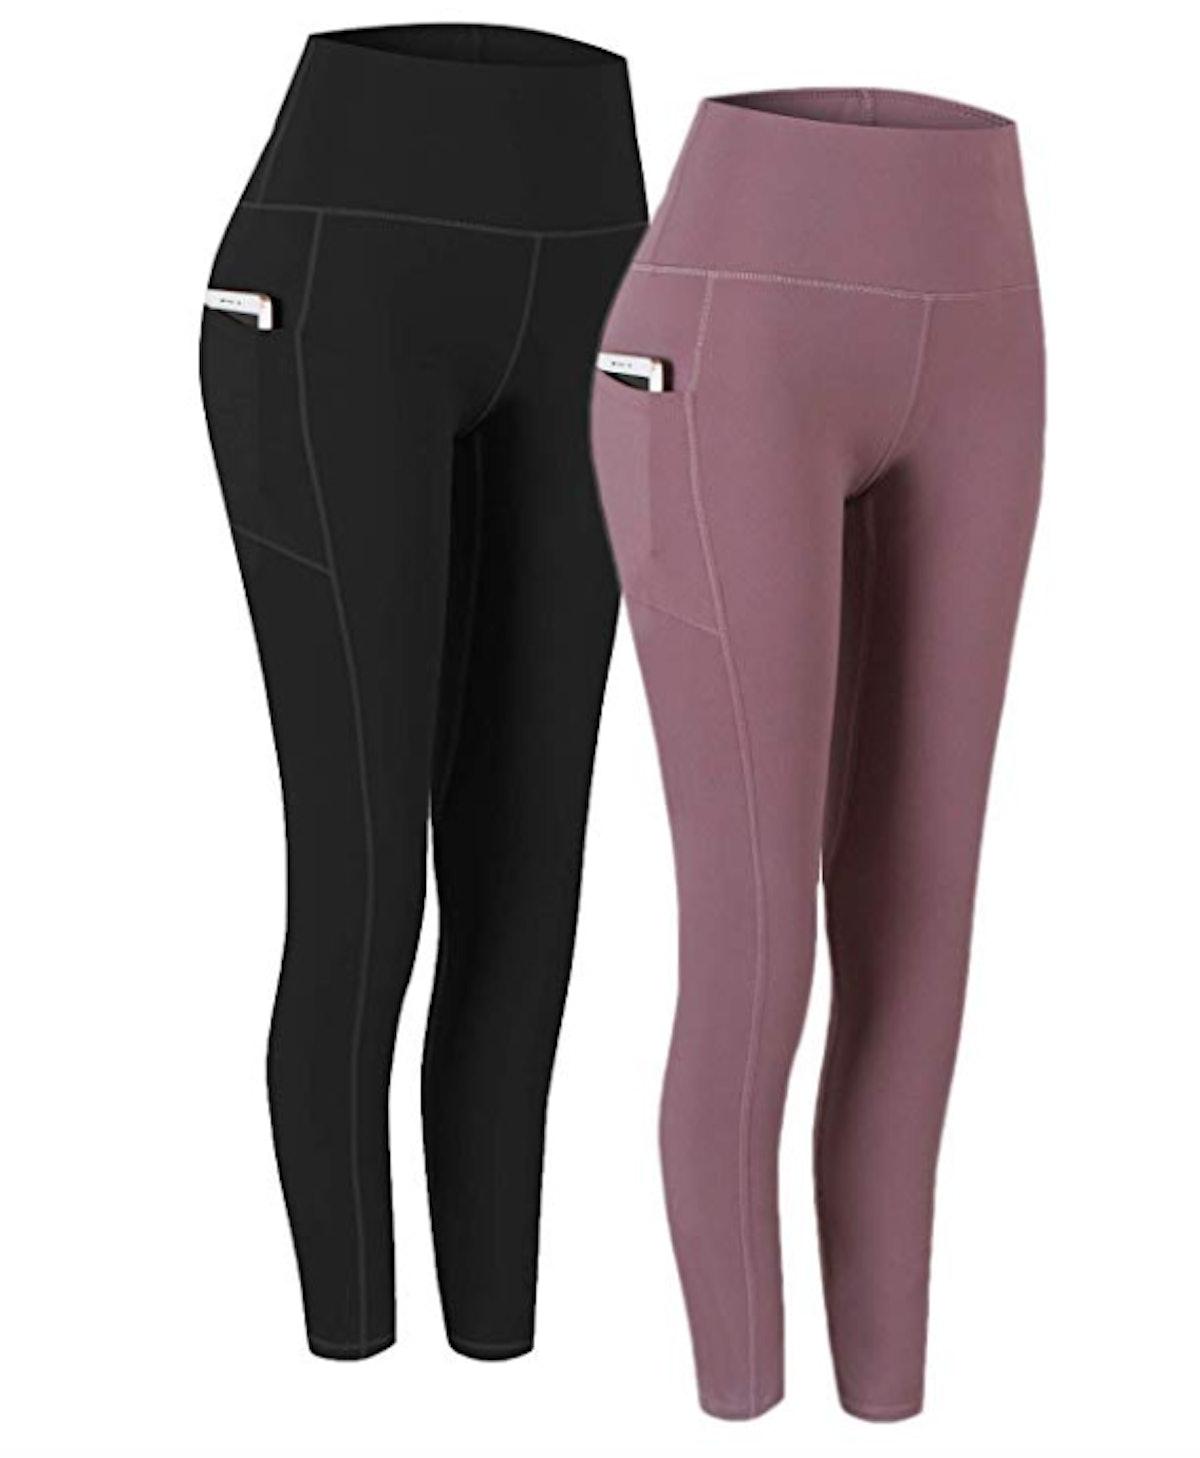 Fengbay High Waist Yoga Pants (2-Pack)